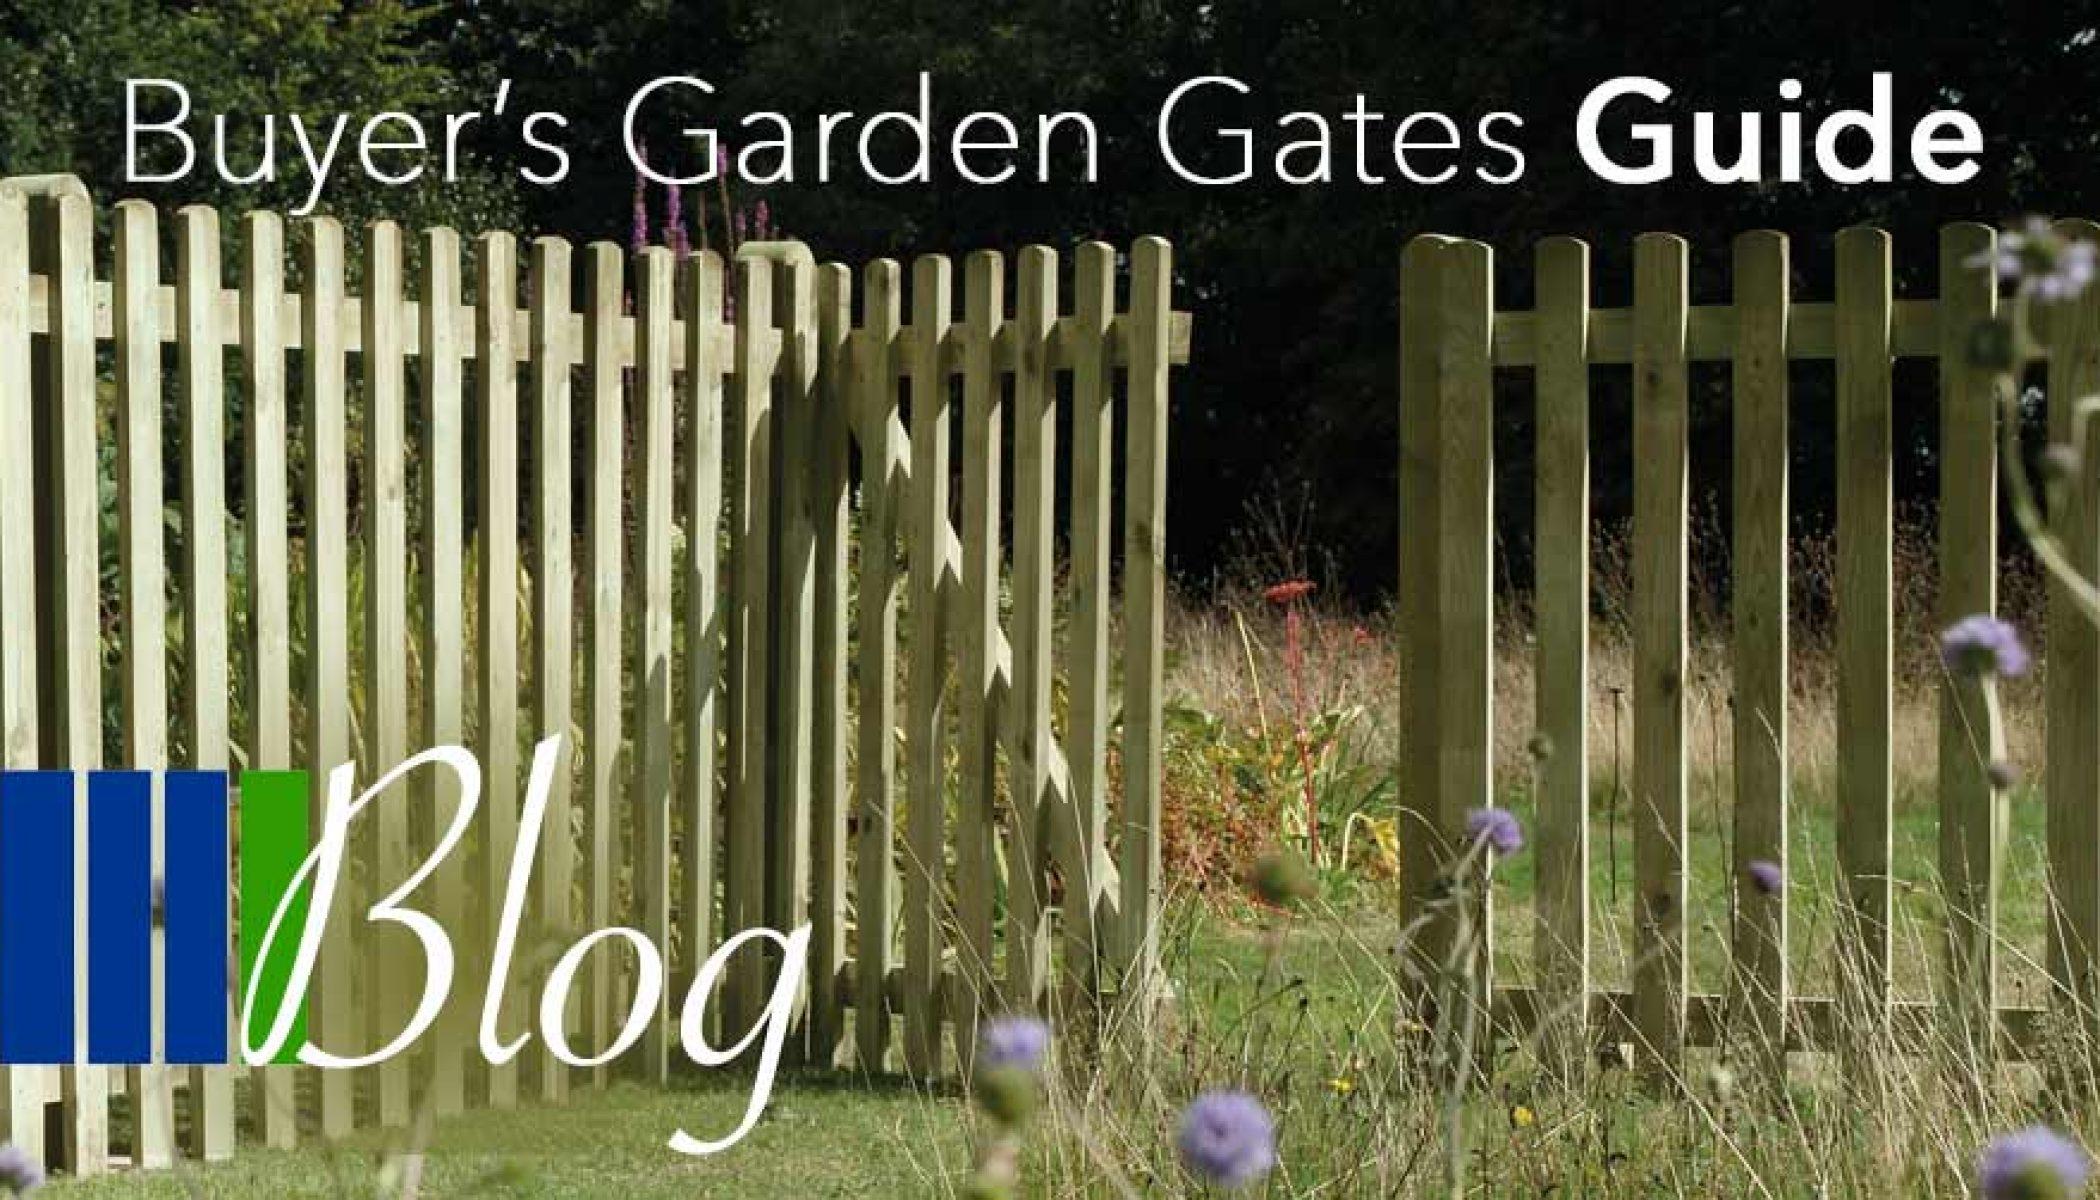 Buyeru0027s Garden Gates Guide